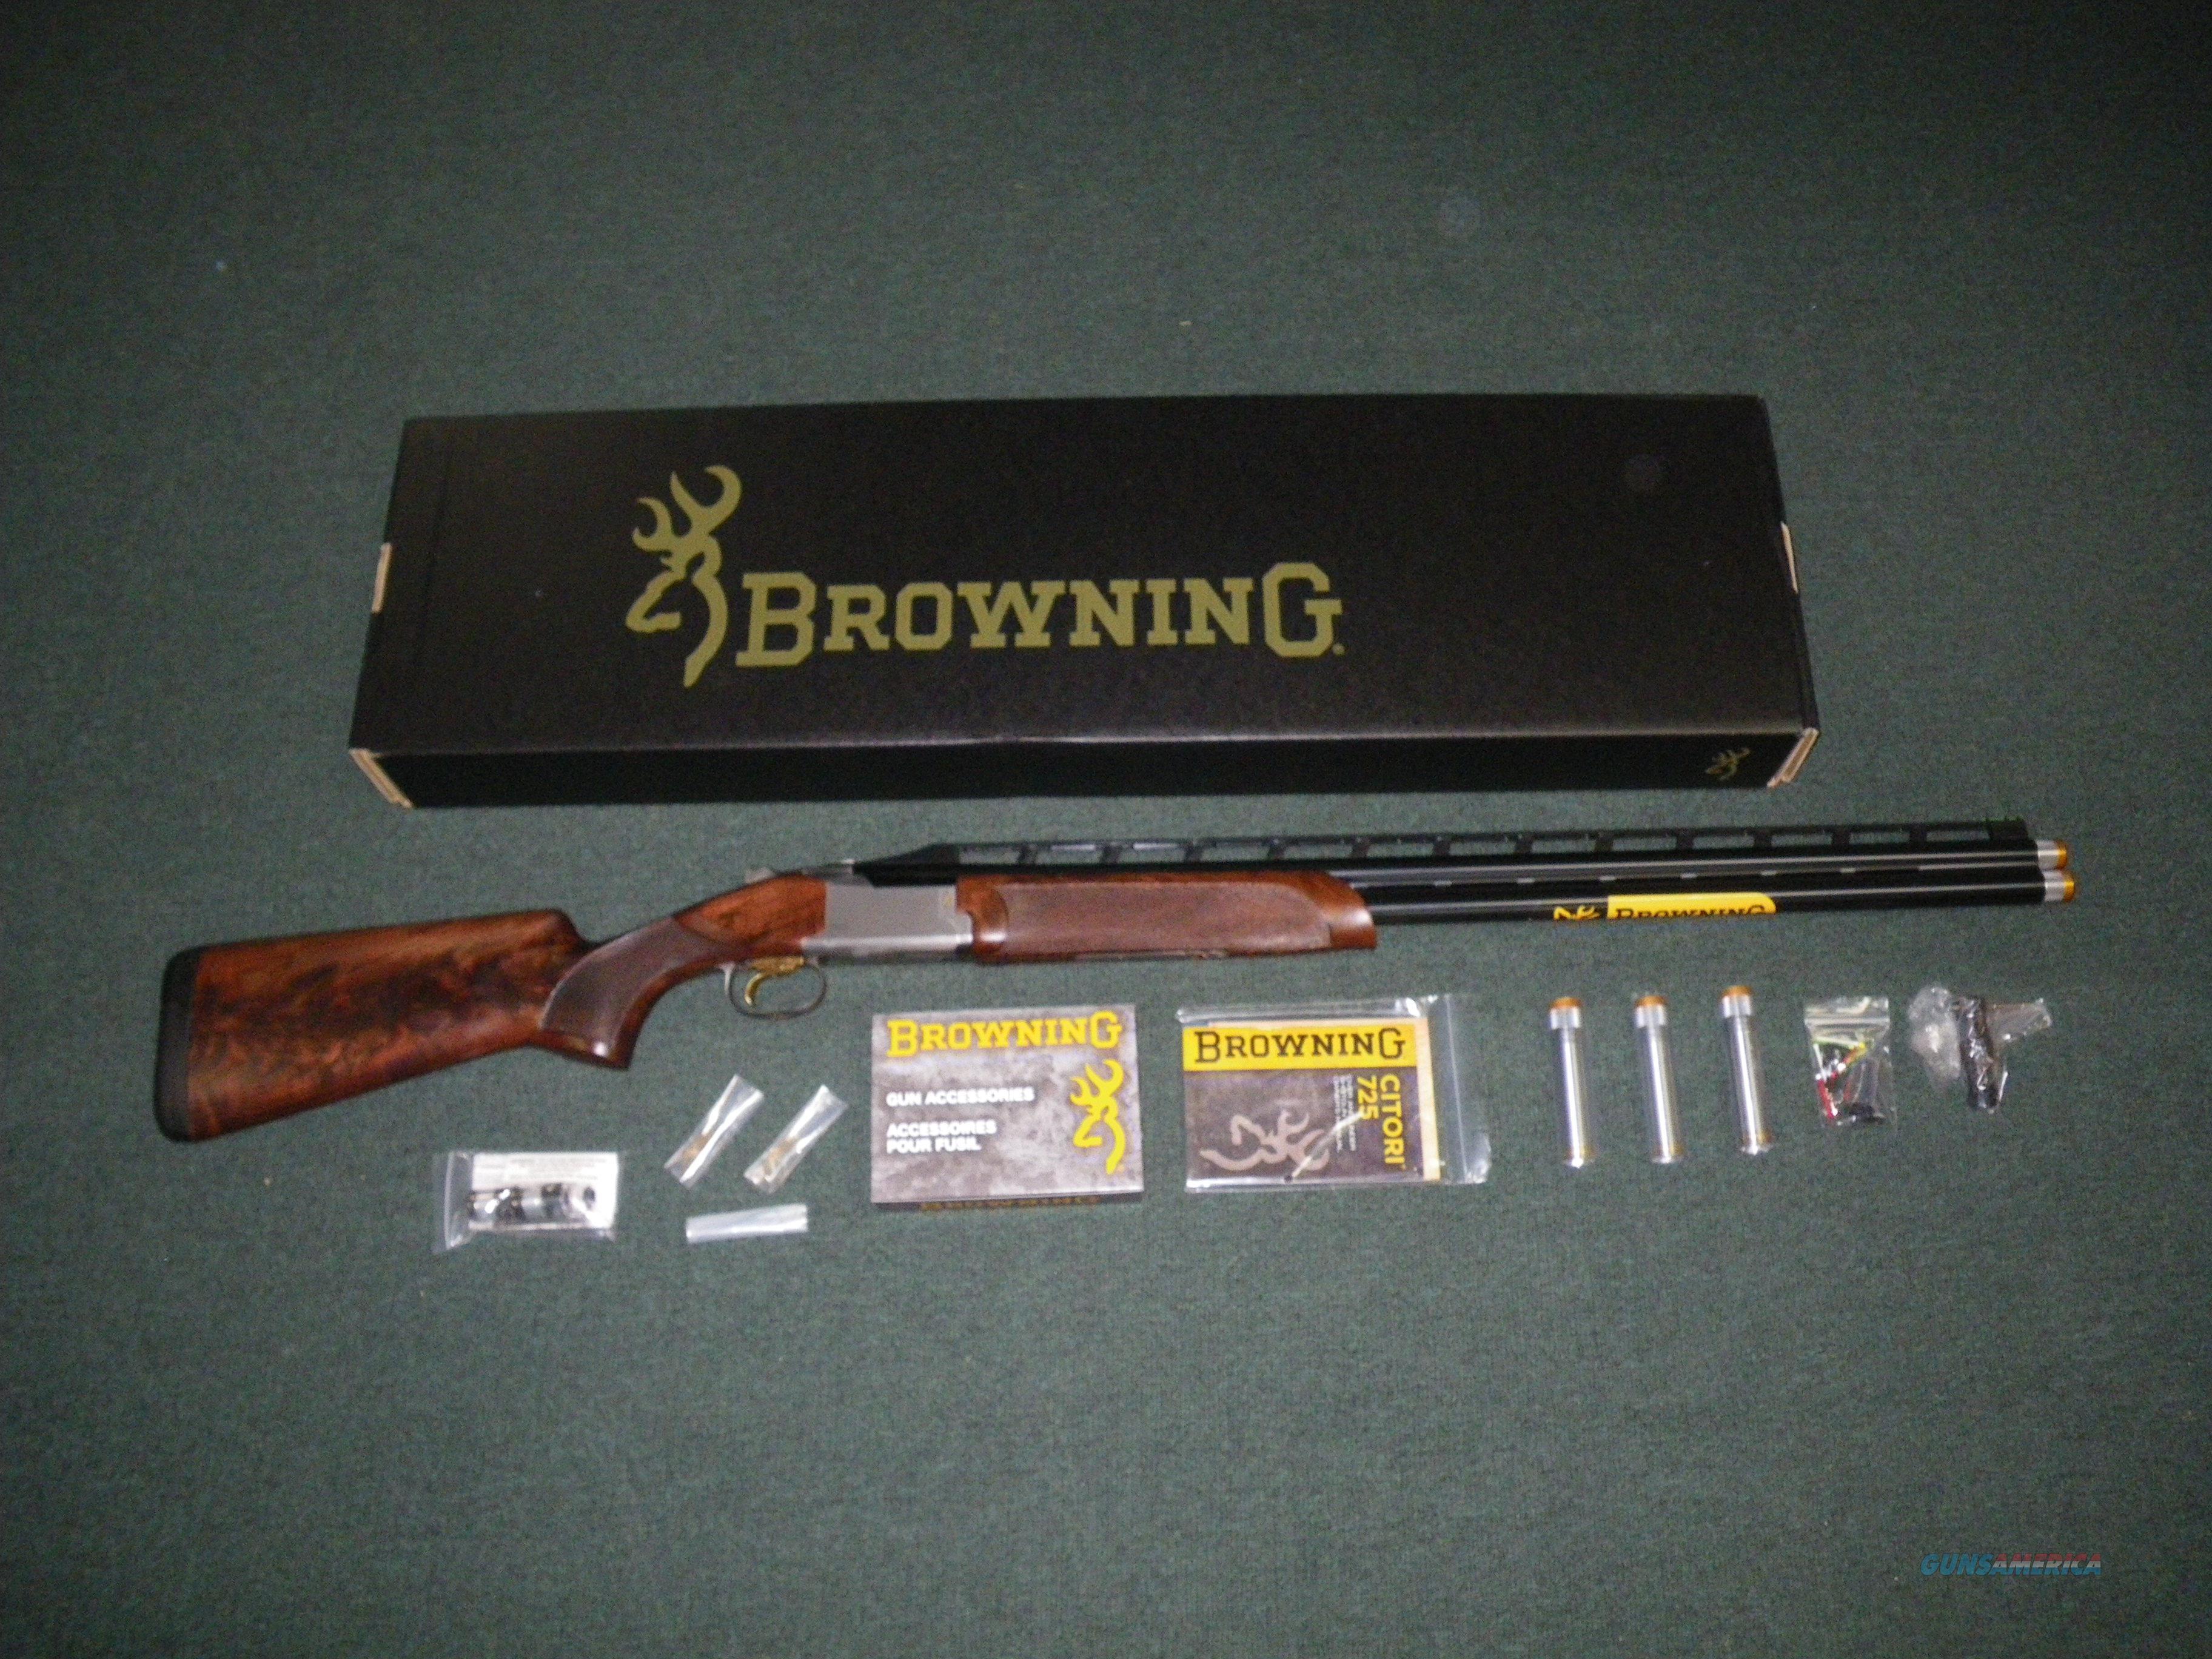 "Browning Citori 725 High Rib Sporting 12ga 32"" NEW #0180553009  Guns > Shotguns > Browning Shotguns > Over Unders > Citori > Hunting"